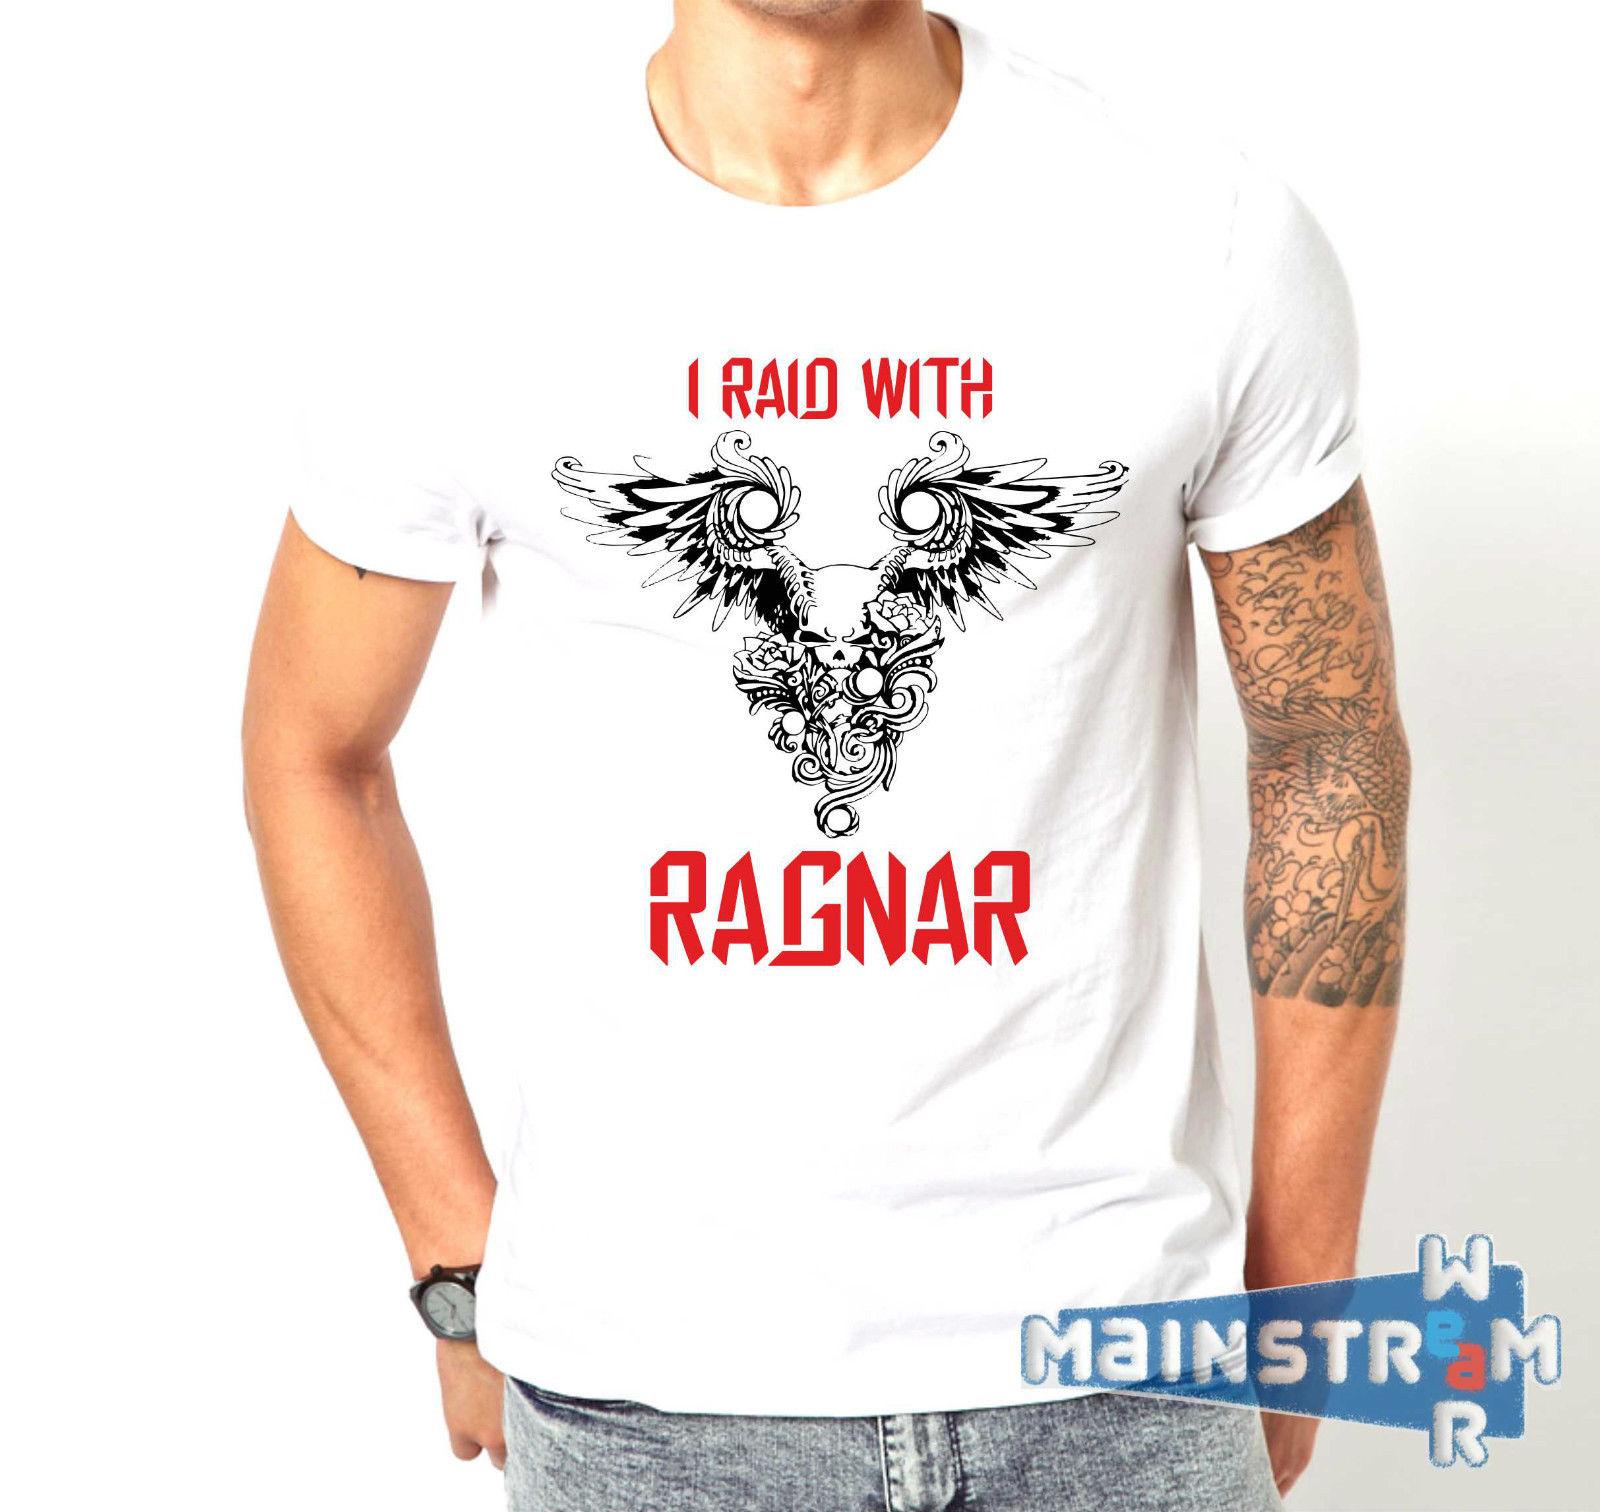 Camiseta MAGLIETTA vikingos VICHINGHI RAGNAR LOTHBROK Valhala SHIELDMAIDEN NORTH 100% Camiseta de algodón, camisetas al por mayor